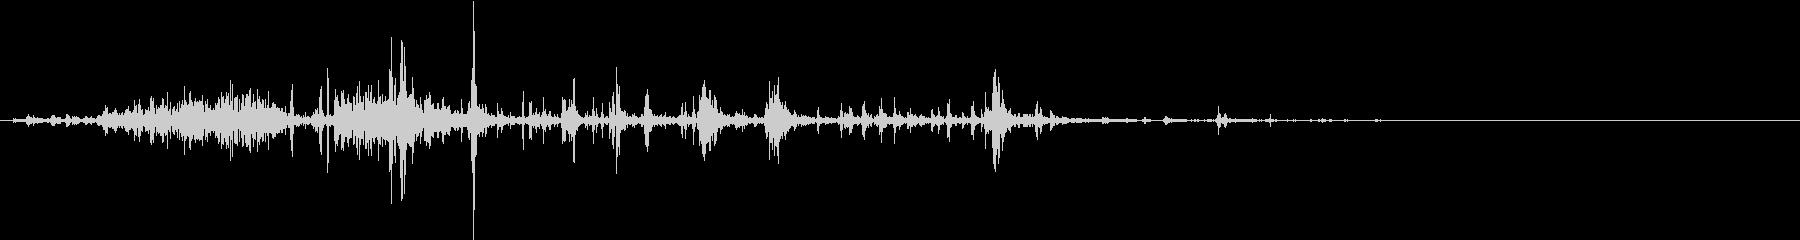 TsubureFX 内臓が潰れる音 1の未再生の波形